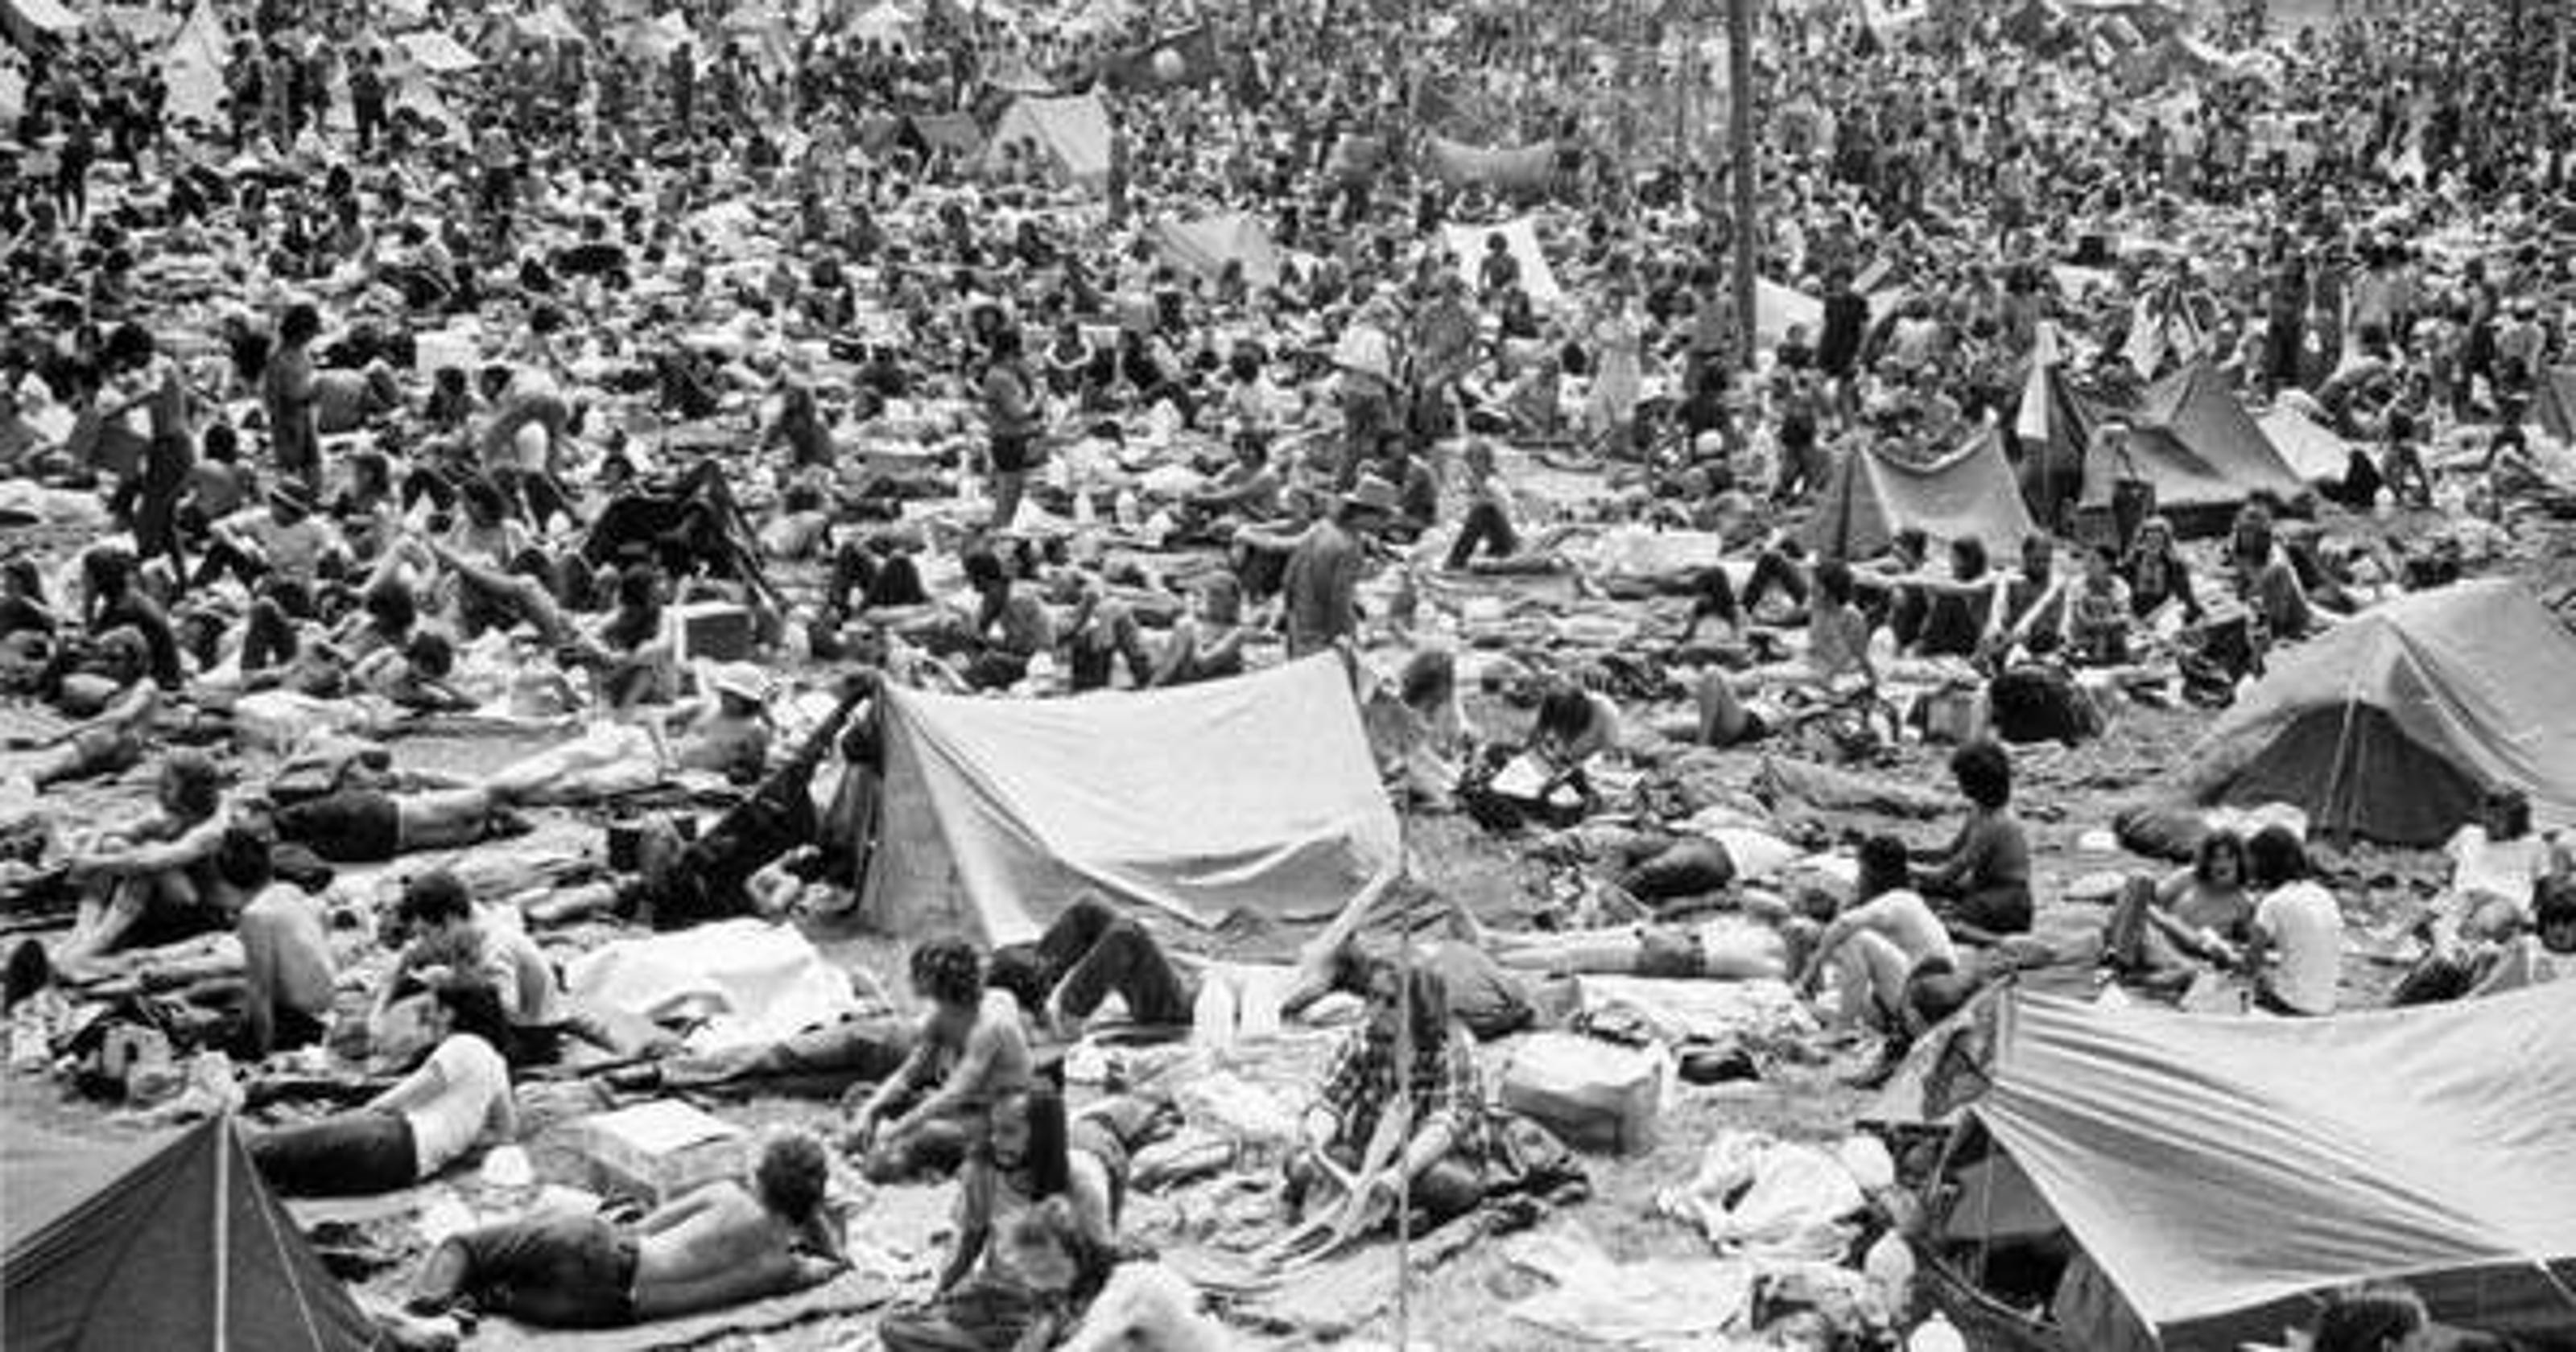 ecfdd26f38d0 Watkins Glen Summer Jam rock concert drew 600